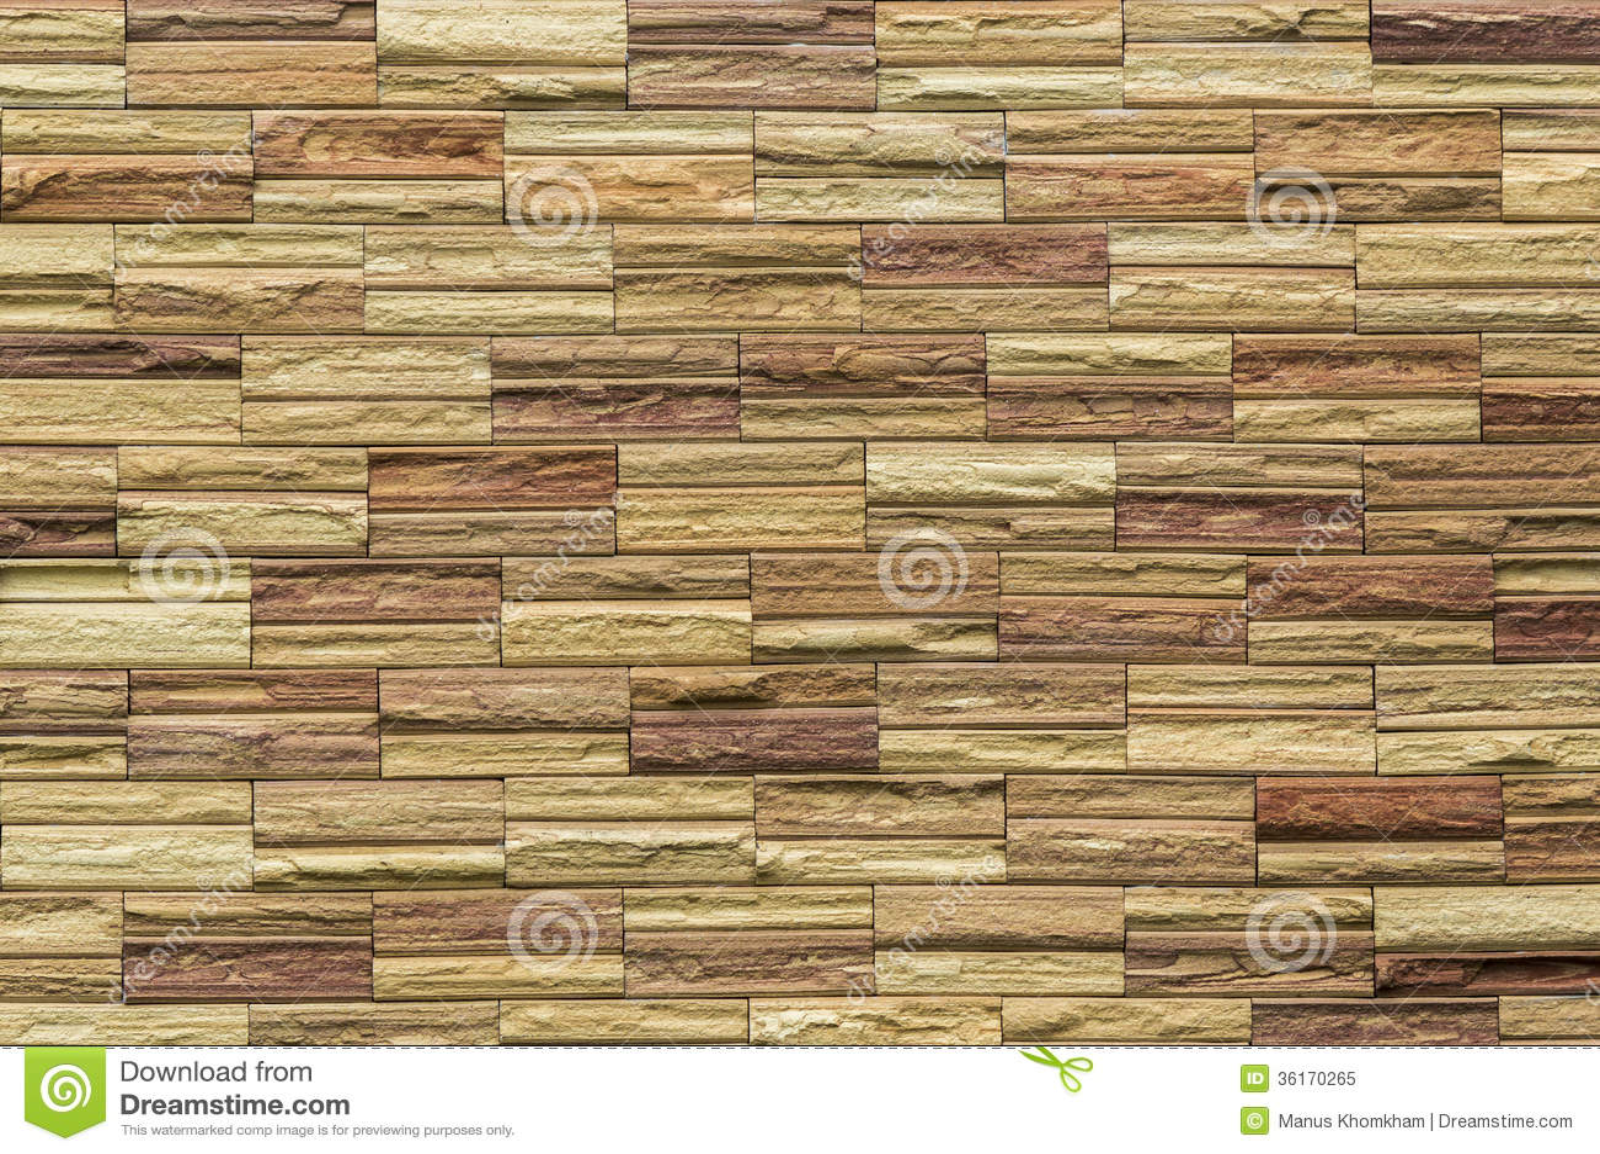 Brick Tile Wall Interior Design